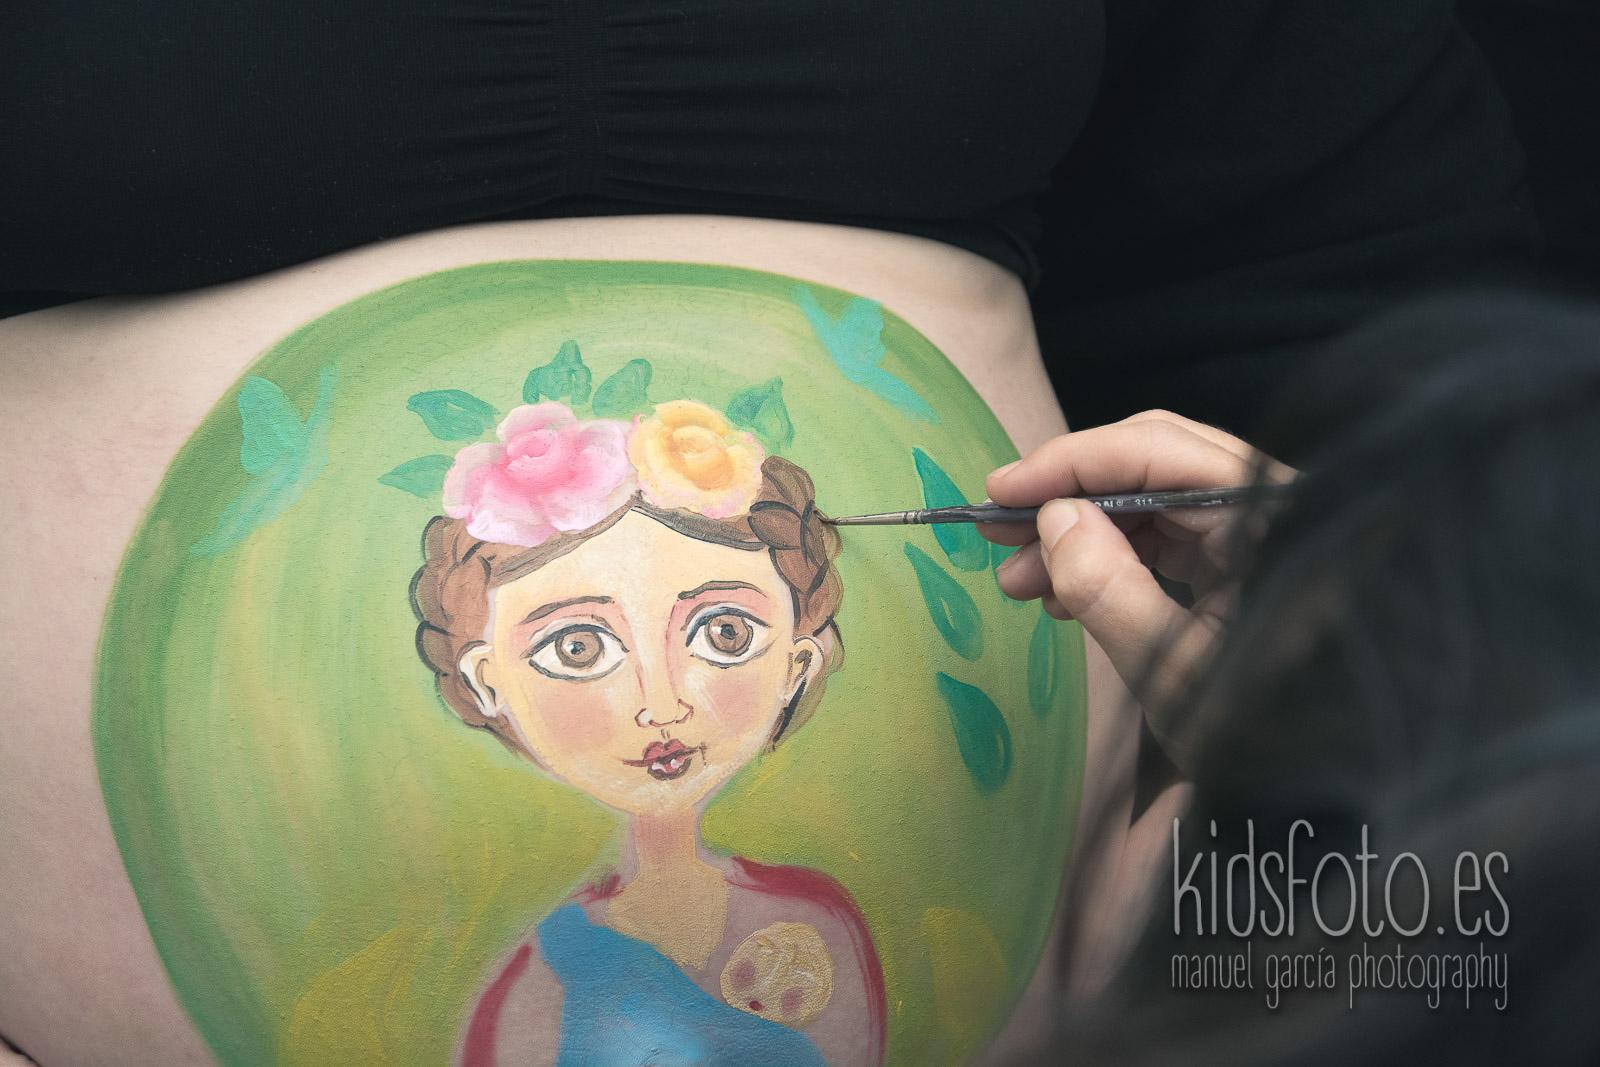 kidsfoto.es Body paint Bellypainting Sesión Premamá Zaragoza